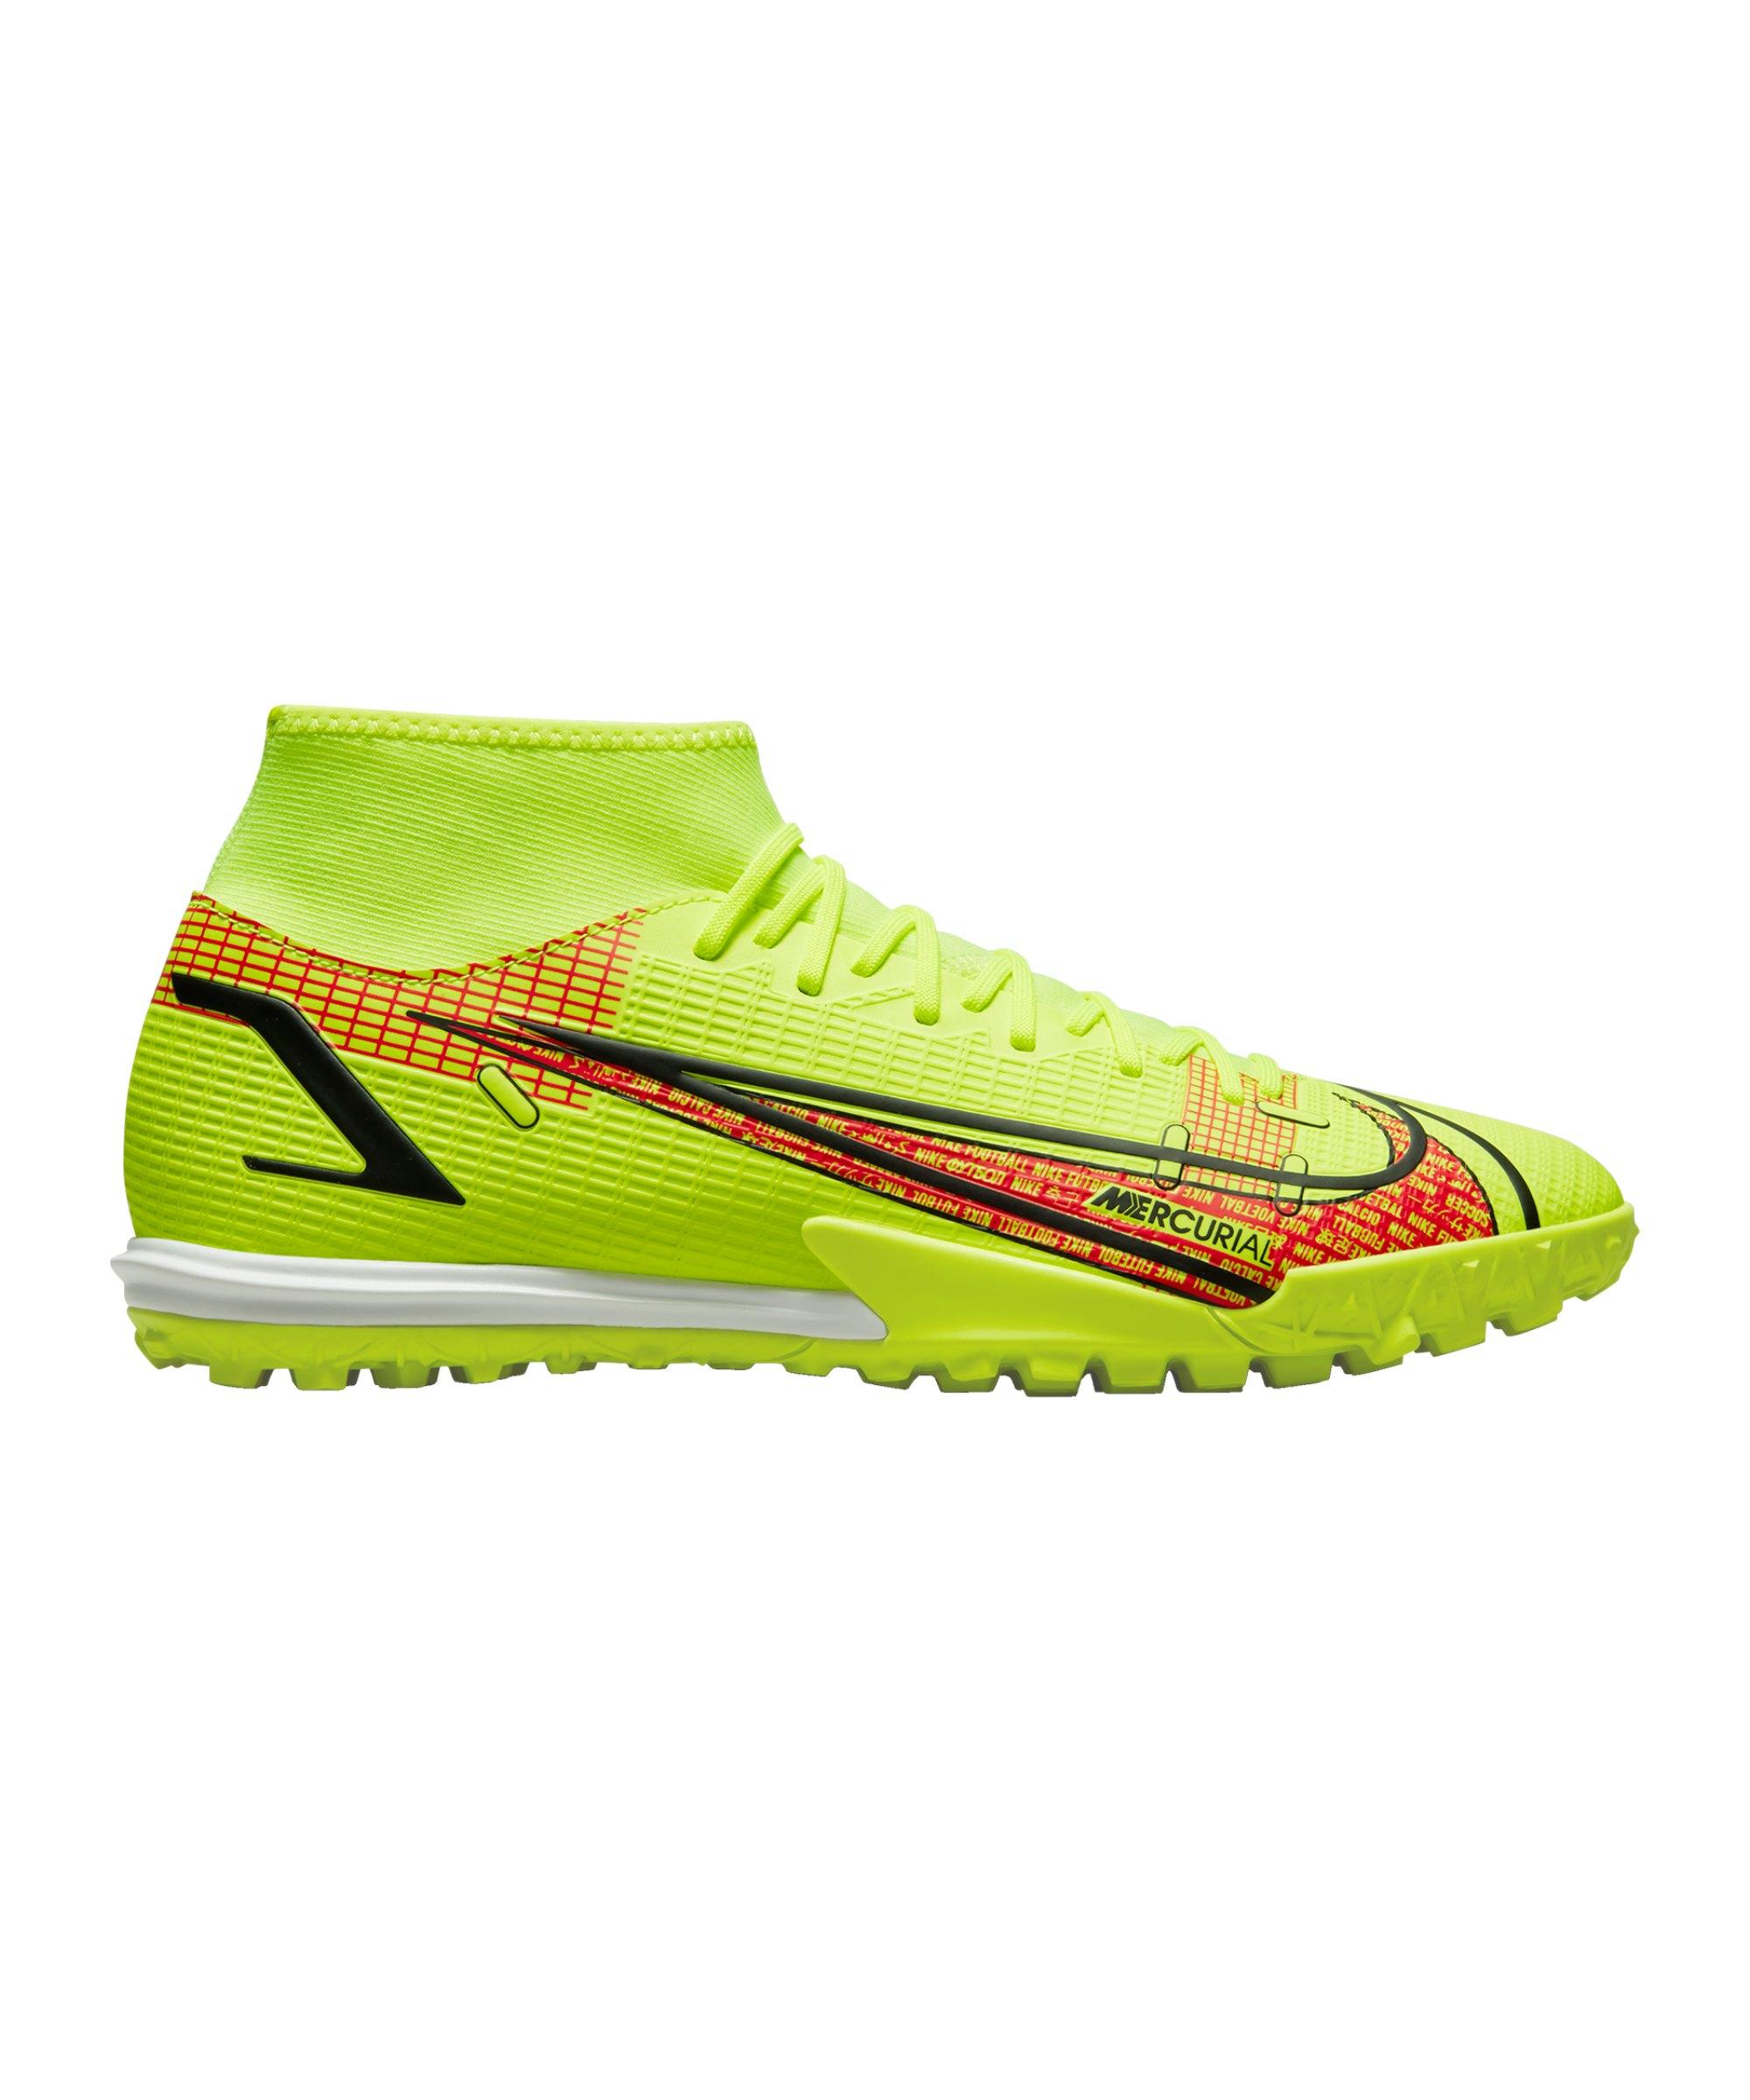 Nike Mercurial Superfly VIII Motivation Academy TF Gelb F760 - gelb